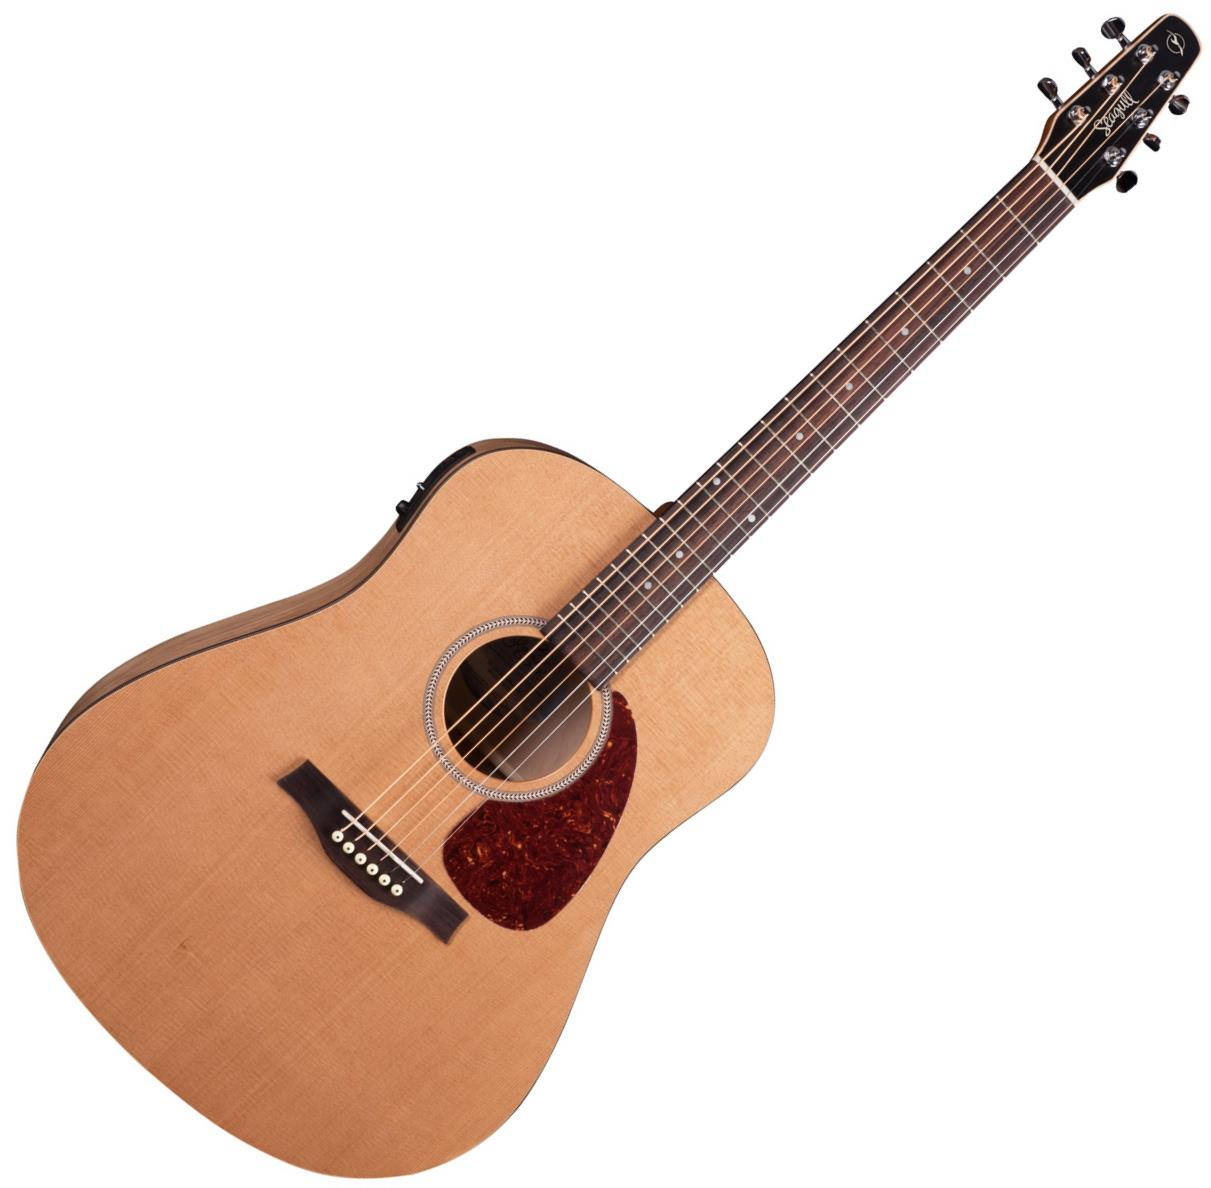 the best acoustic electric guitars under 300 under 500 2018 gearank. Black Bedroom Furniture Sets. Home Design Ideas